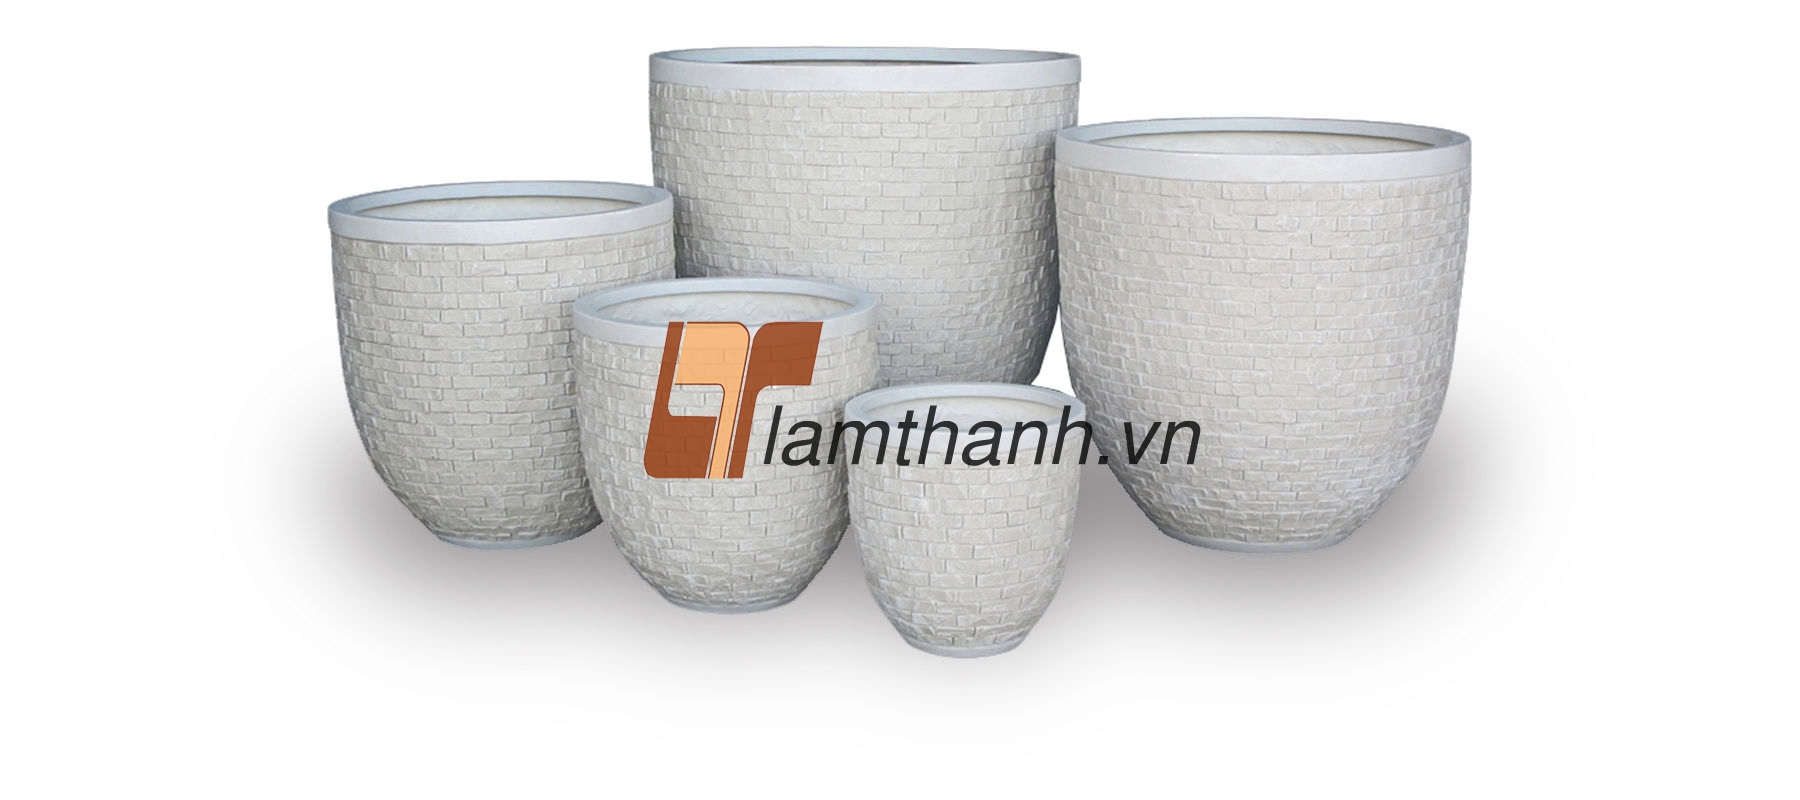 vietnam polystone, outdoor glazed 04